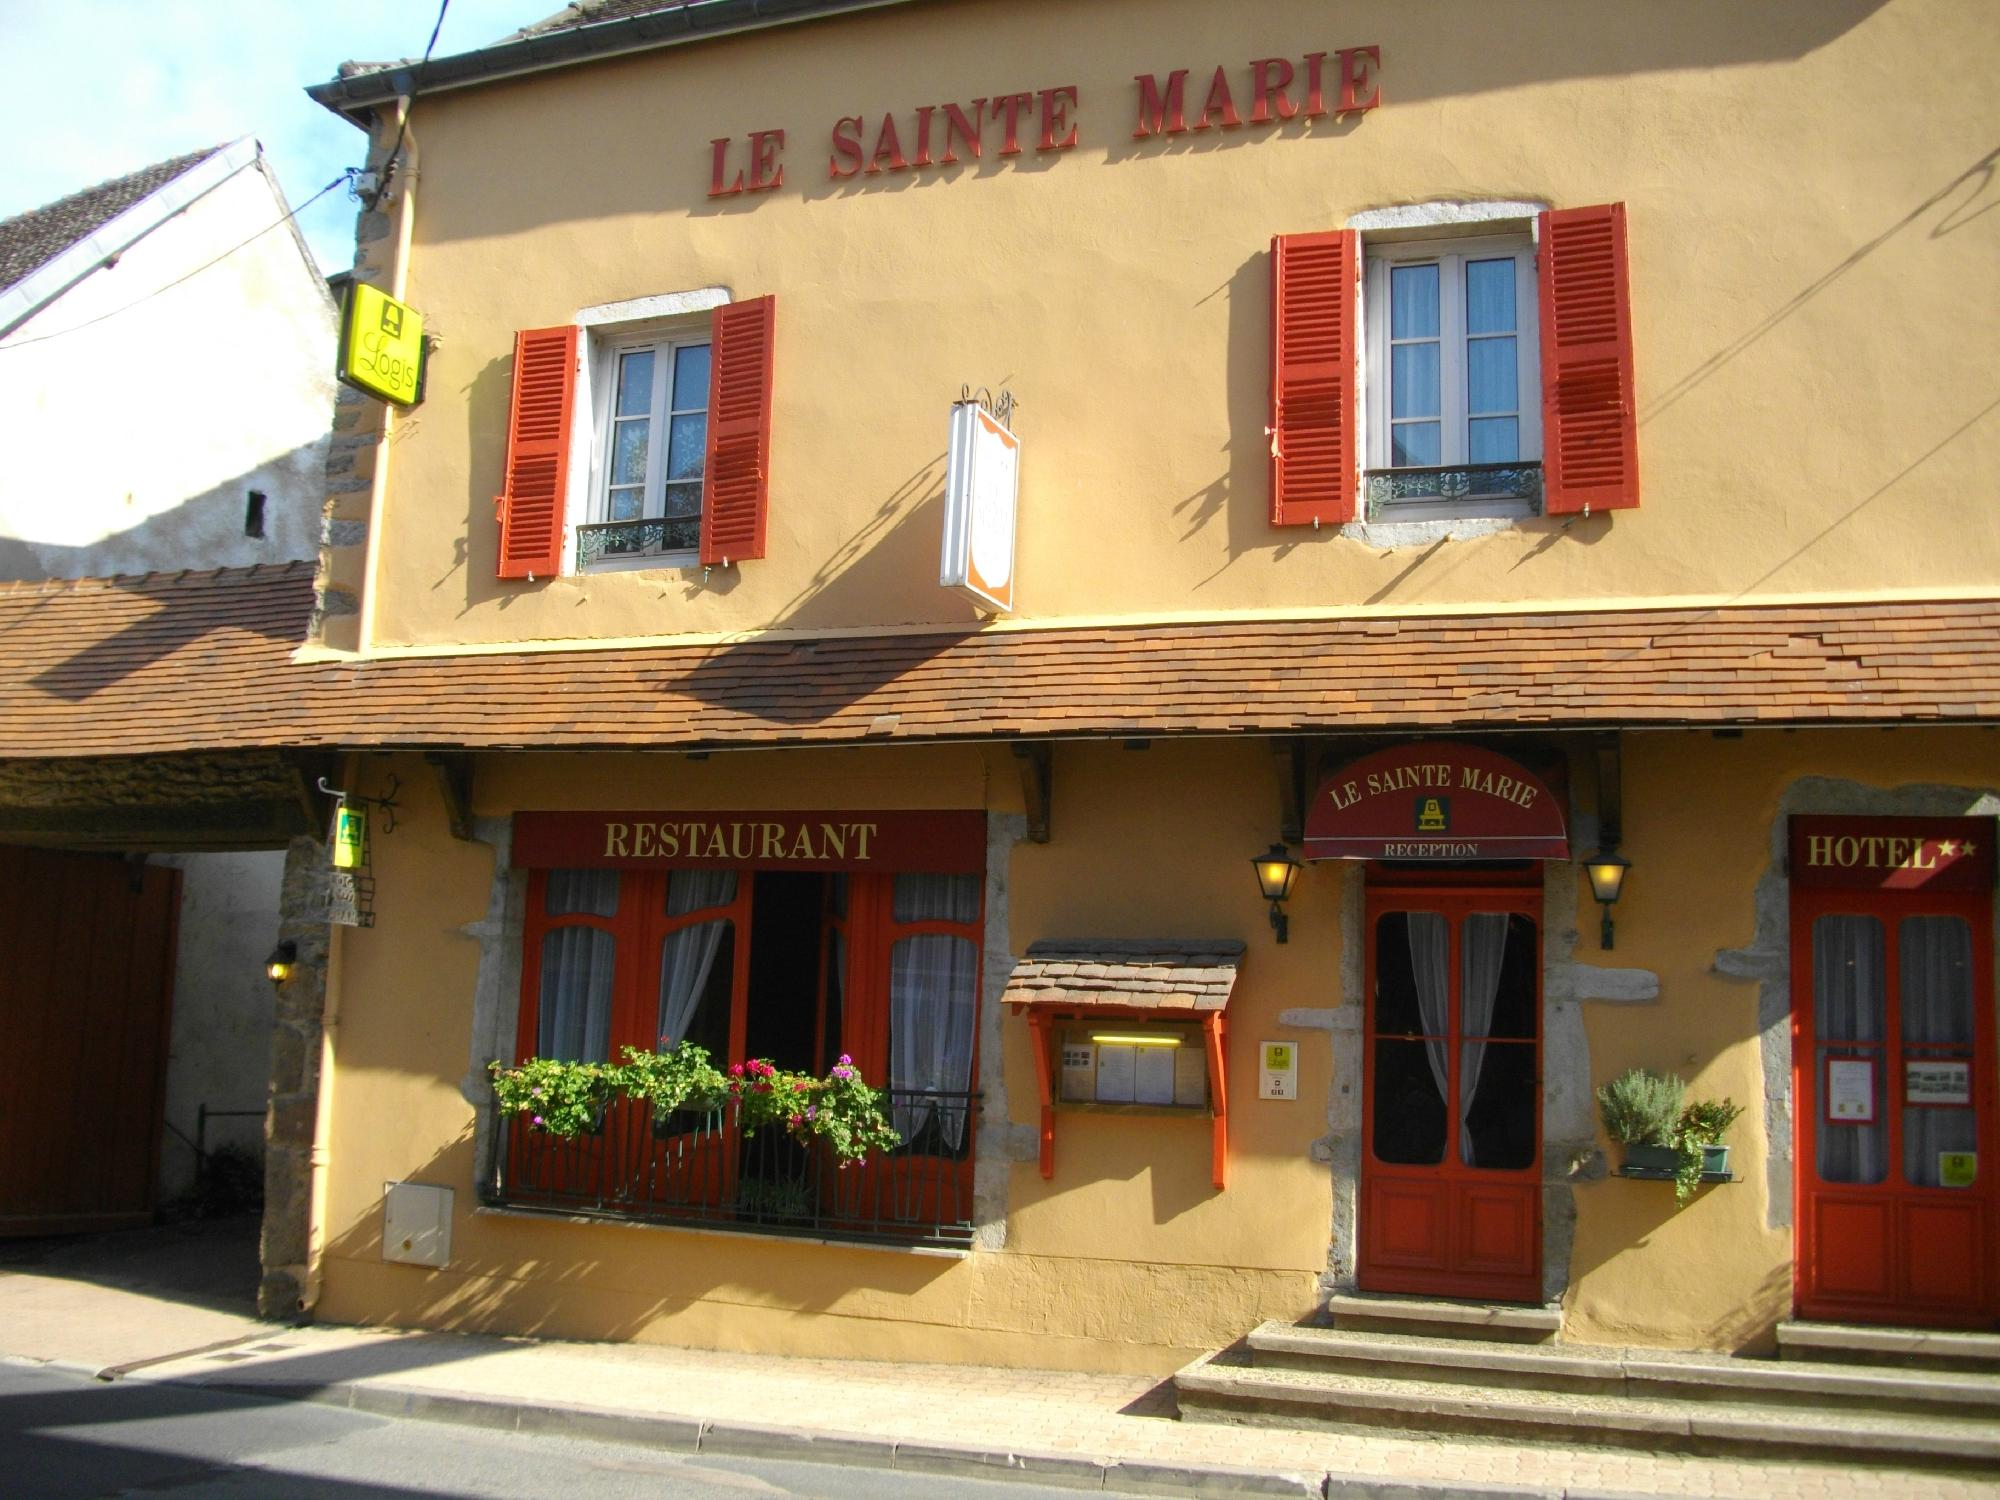 Hotel Sainte Marie